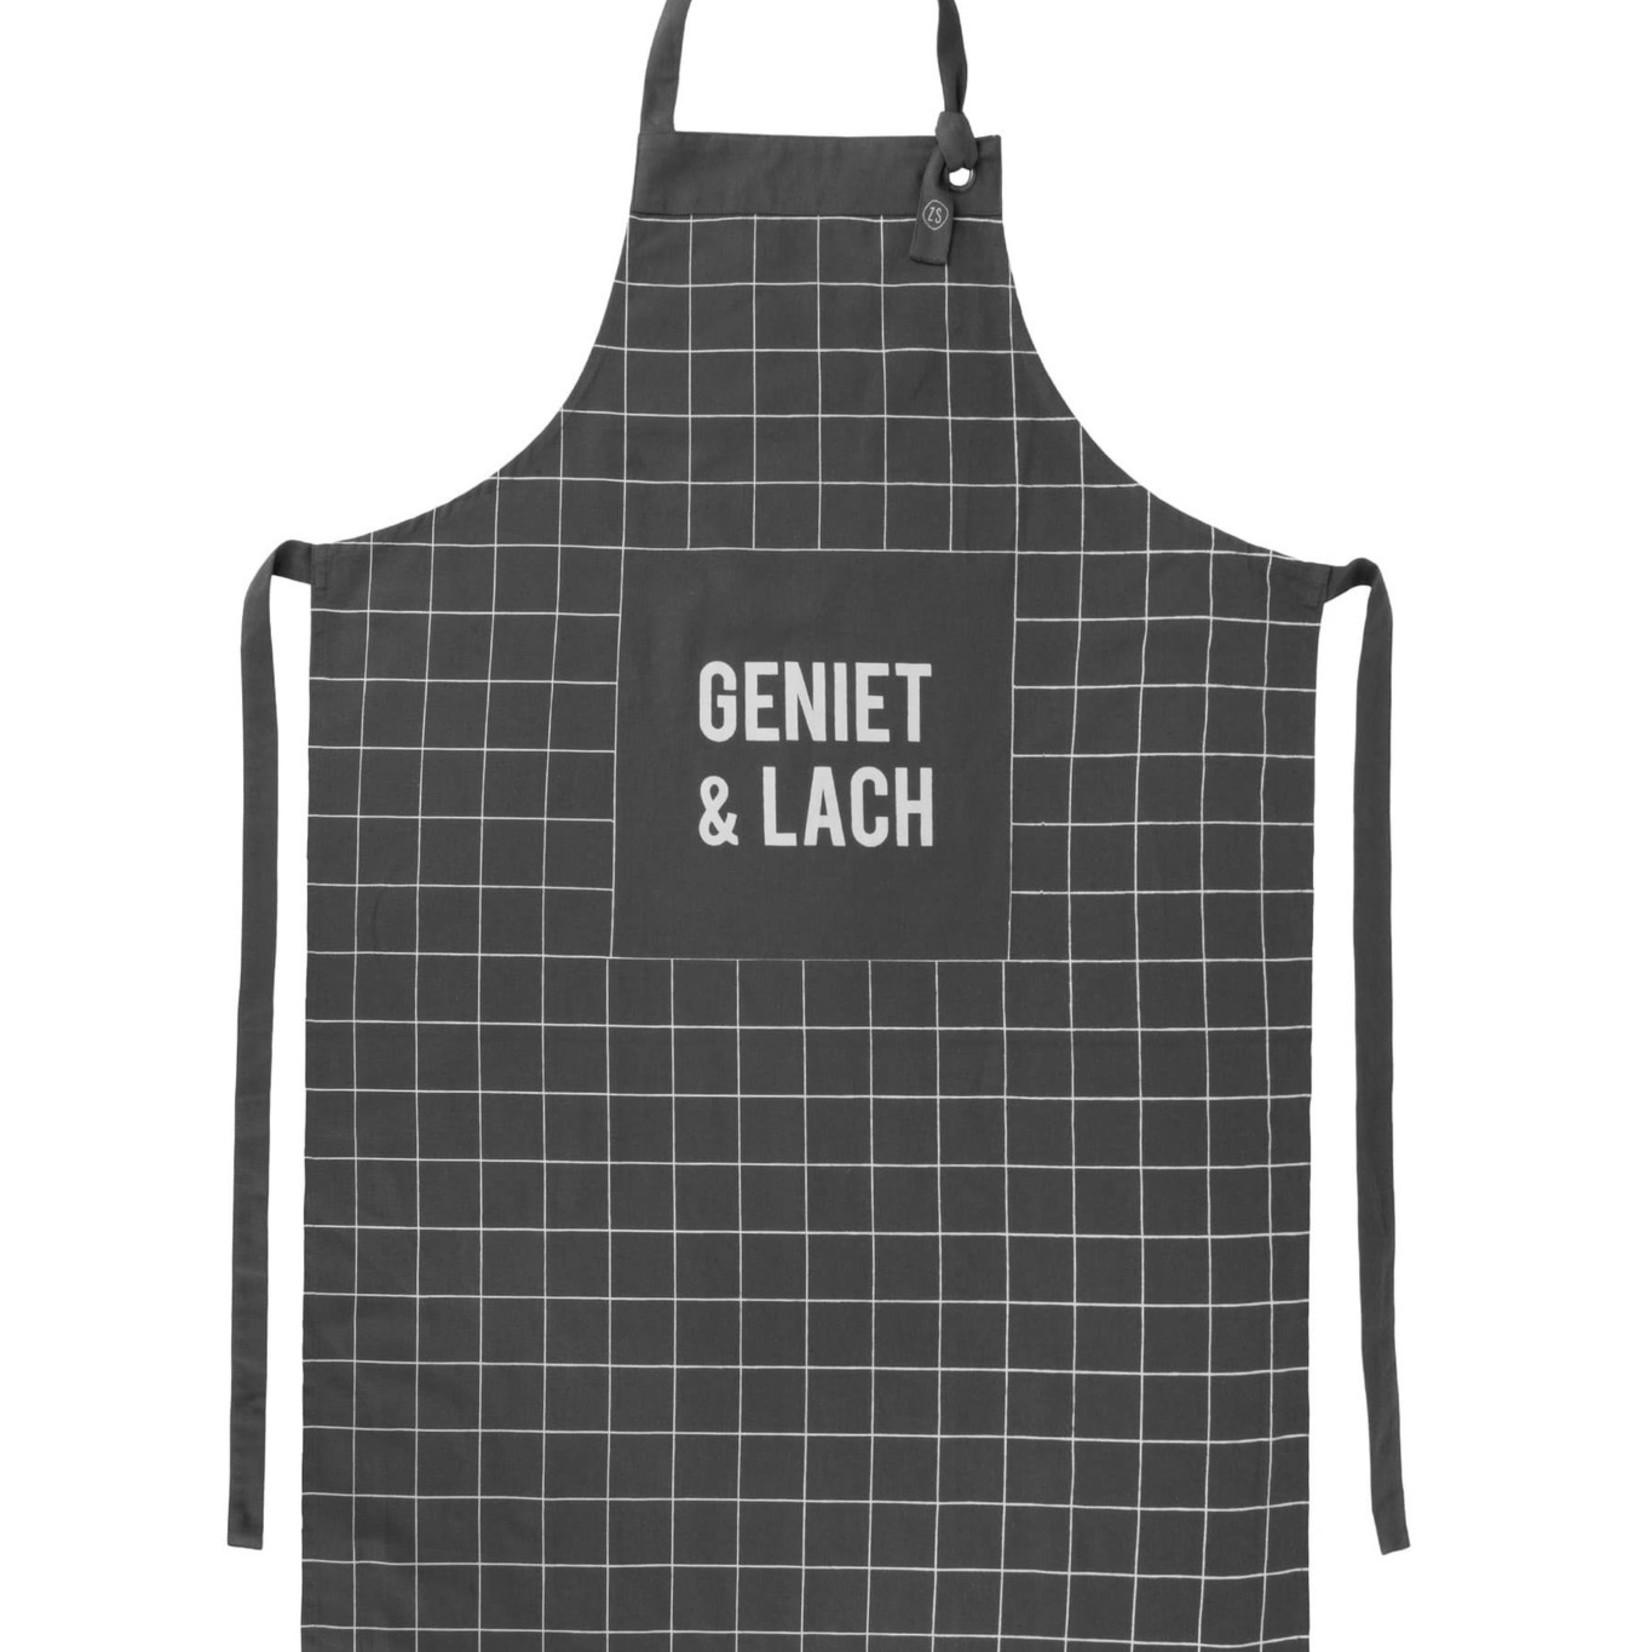 "Keukenschort ""Geniet & Lach"" - Antracietgrijs"